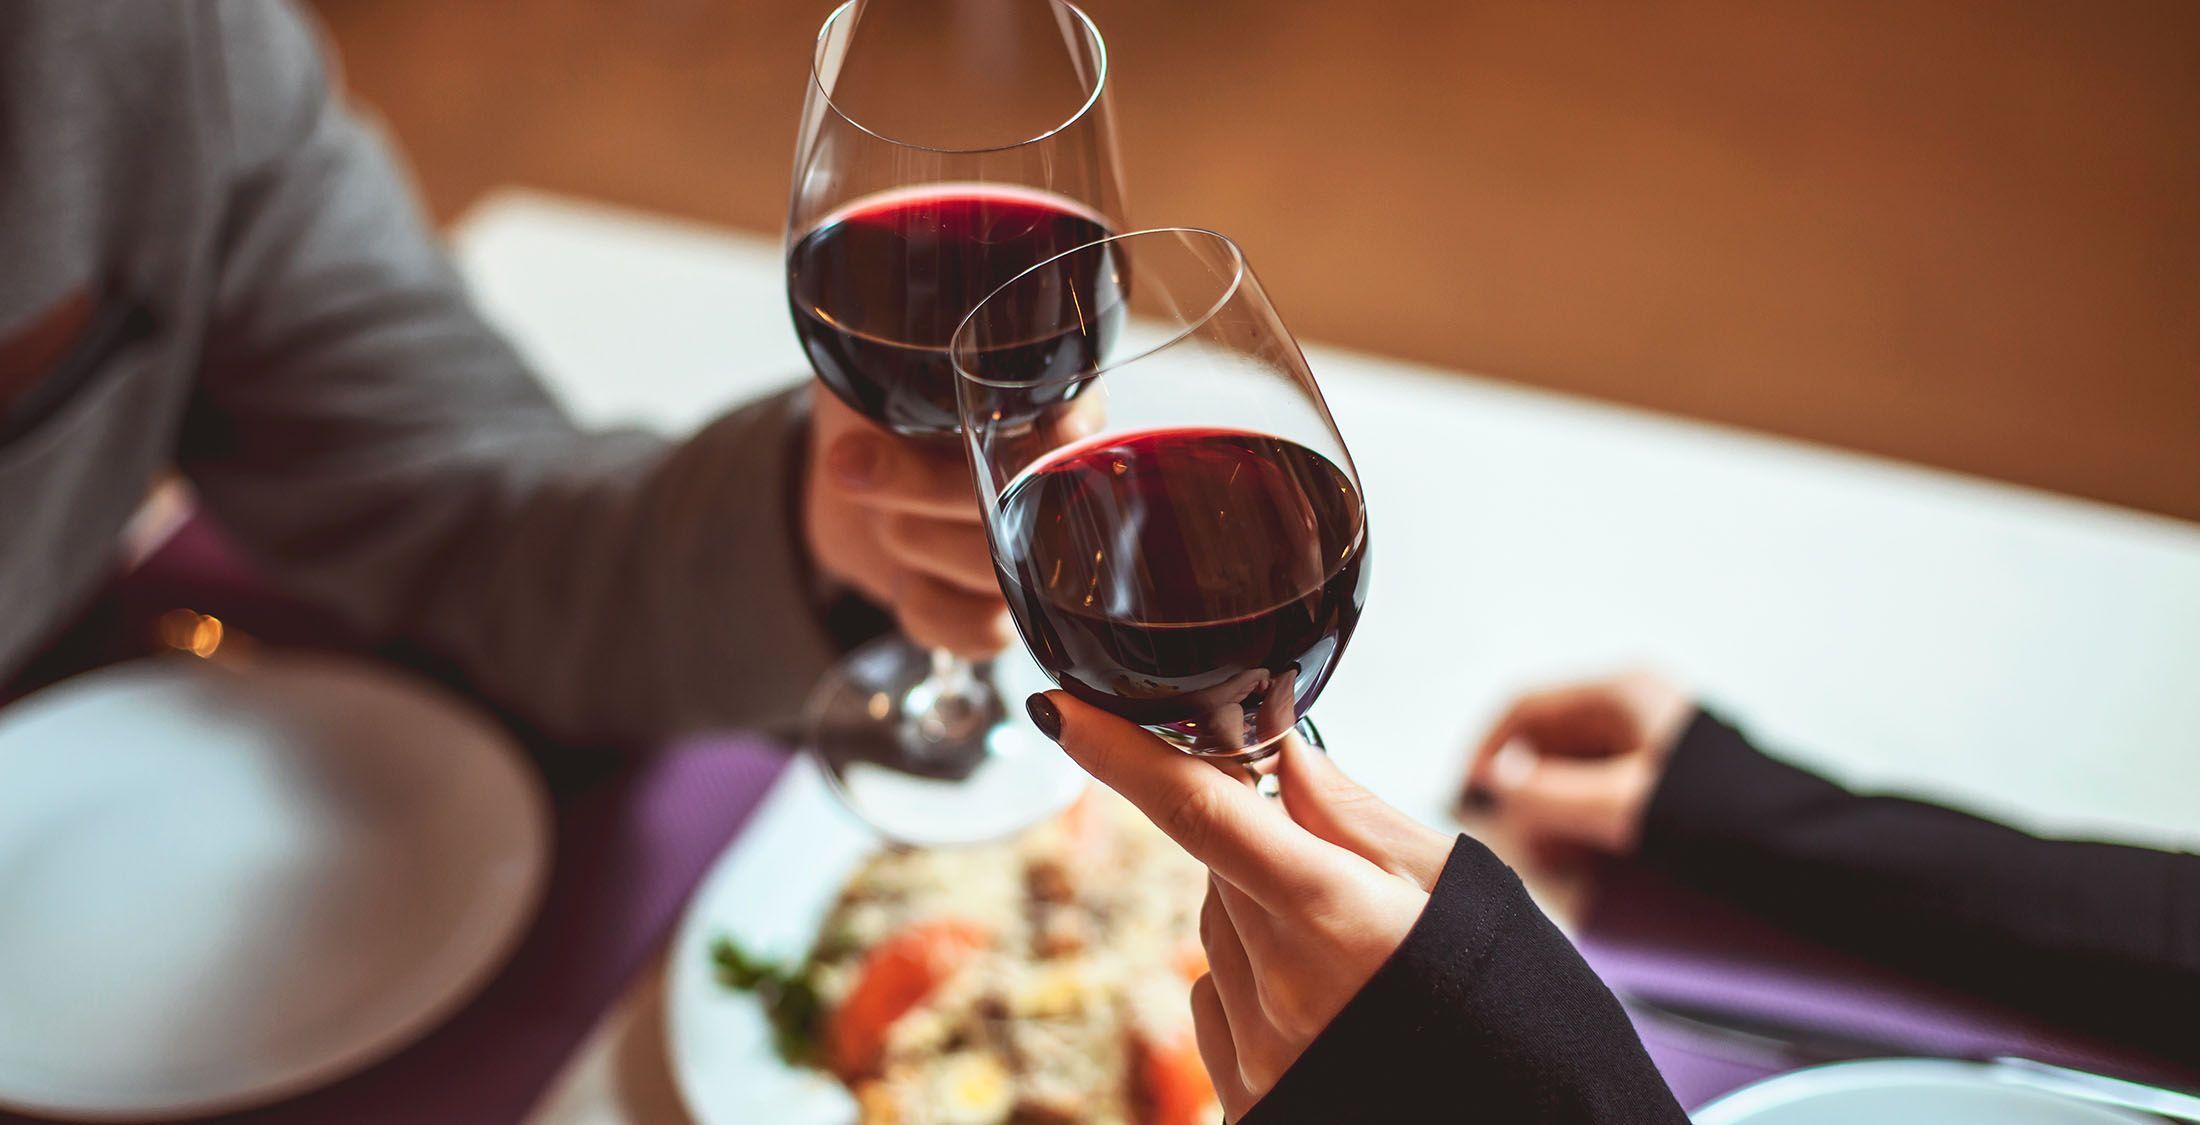 two people toasting wine glasses